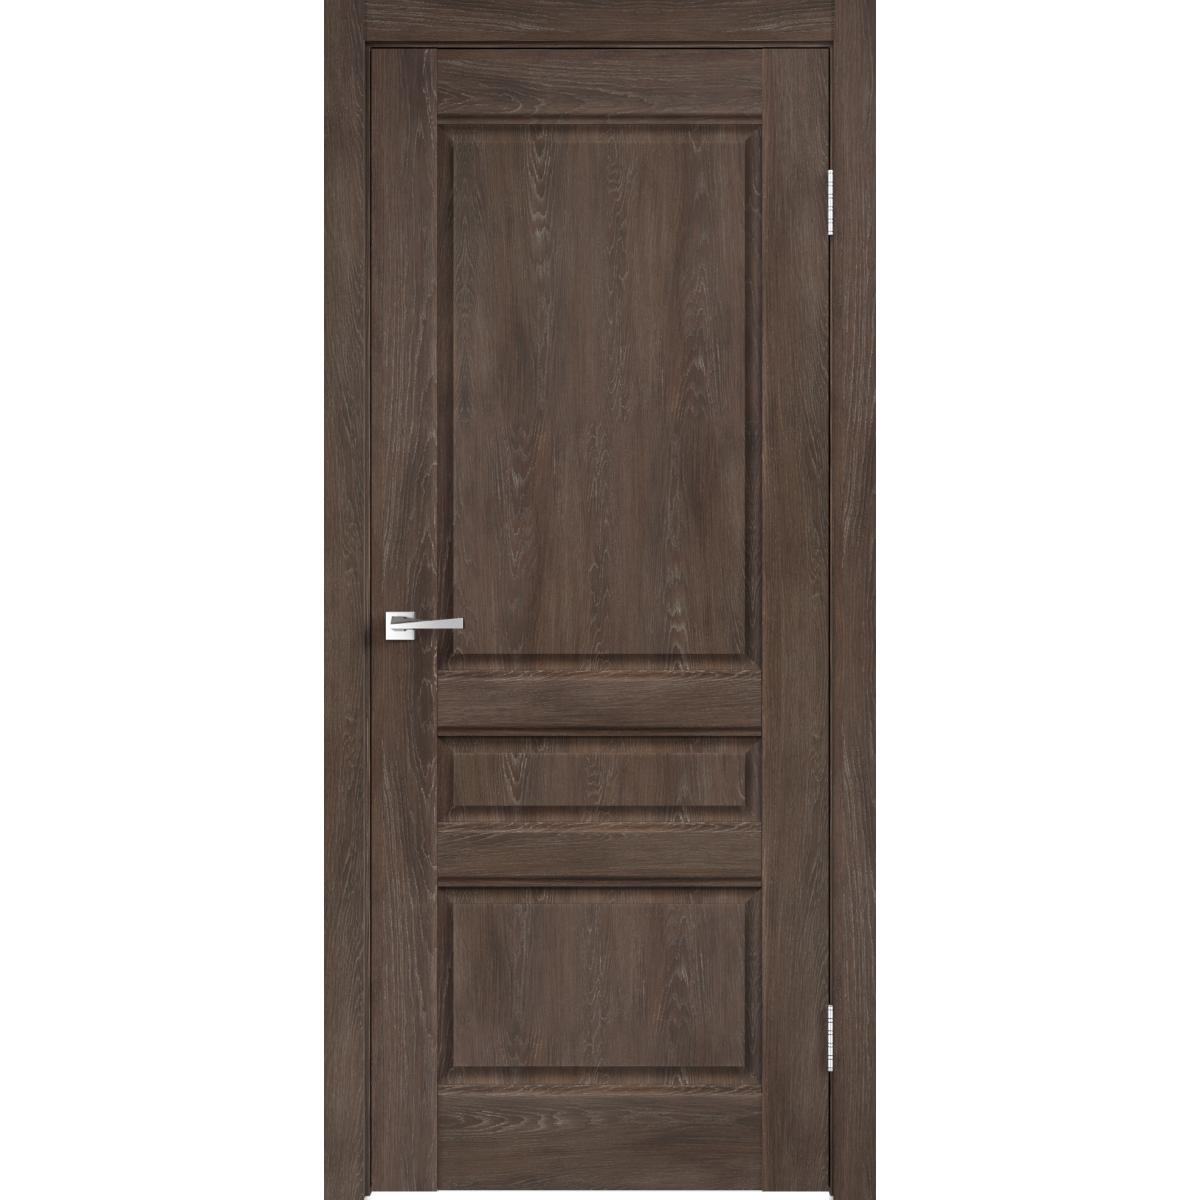 Дверь межкомнатная глухая «Летиция» 70x200 см ПВХ цвет дуб корица с фурнитурой